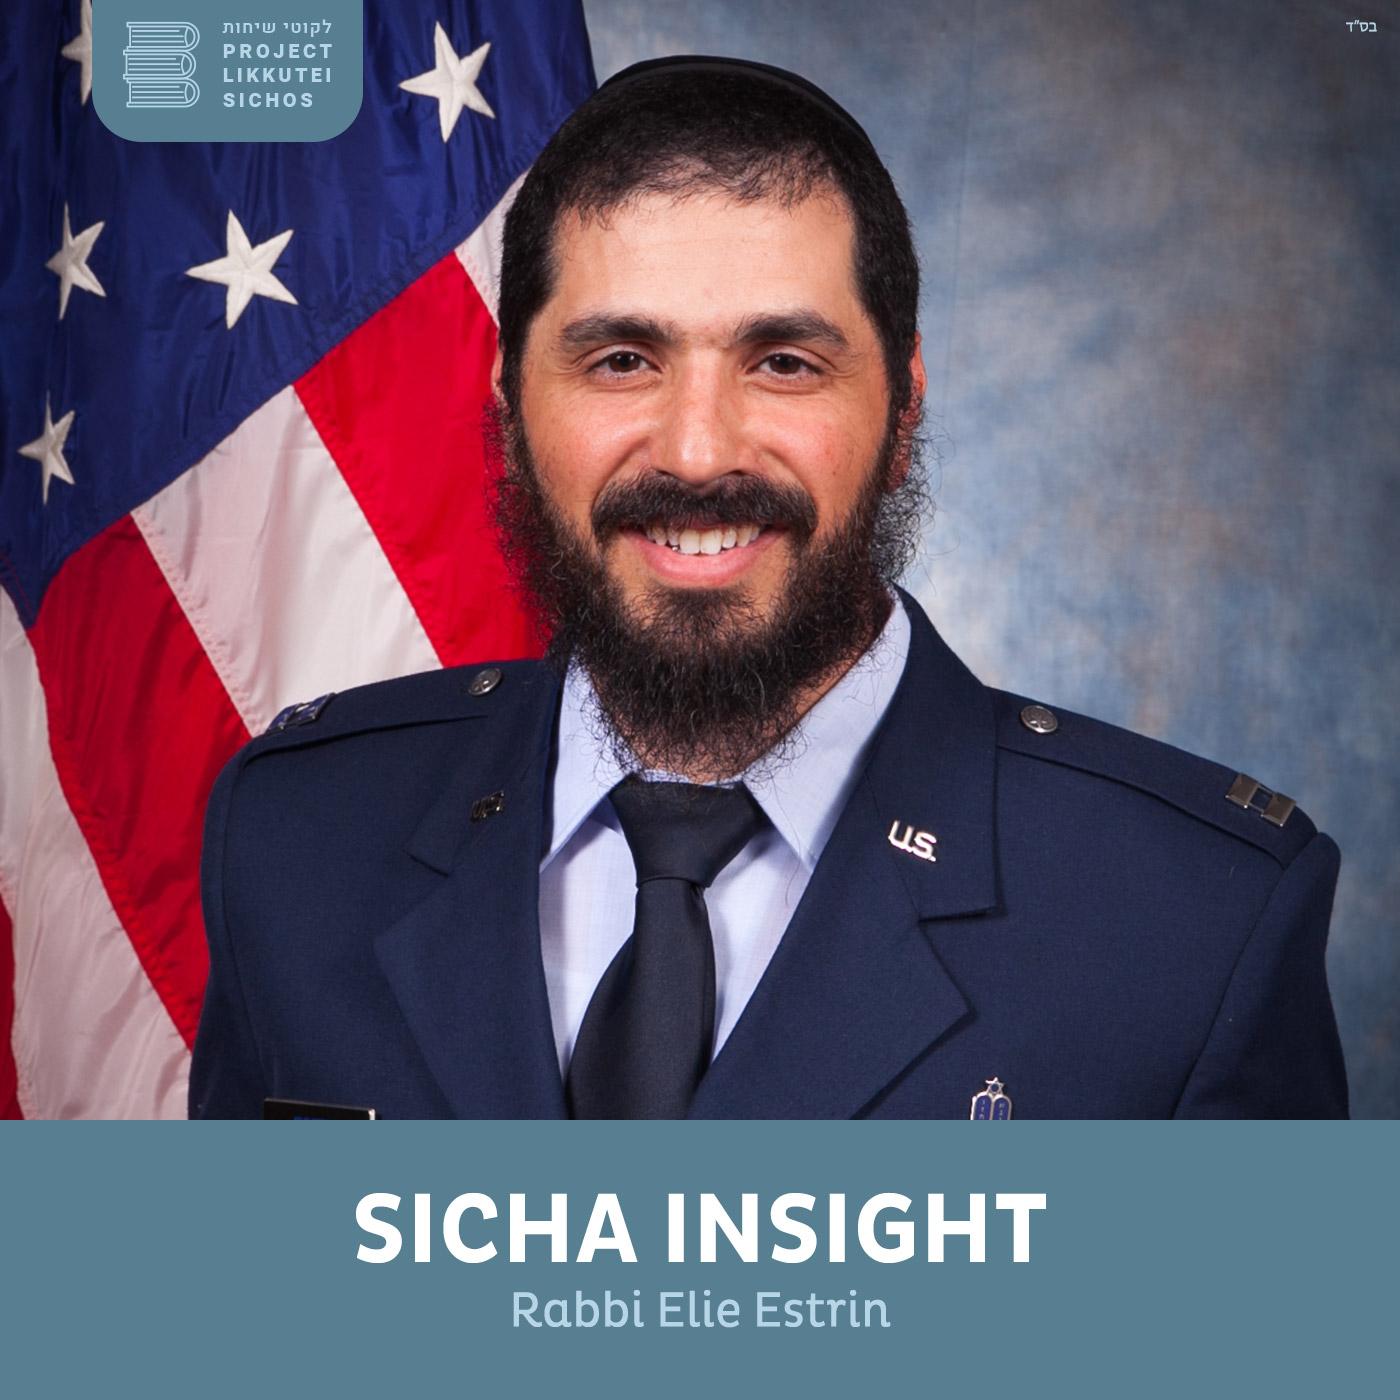 Artwork for podcast Sicha Insights, Rabbi Elie Estrin